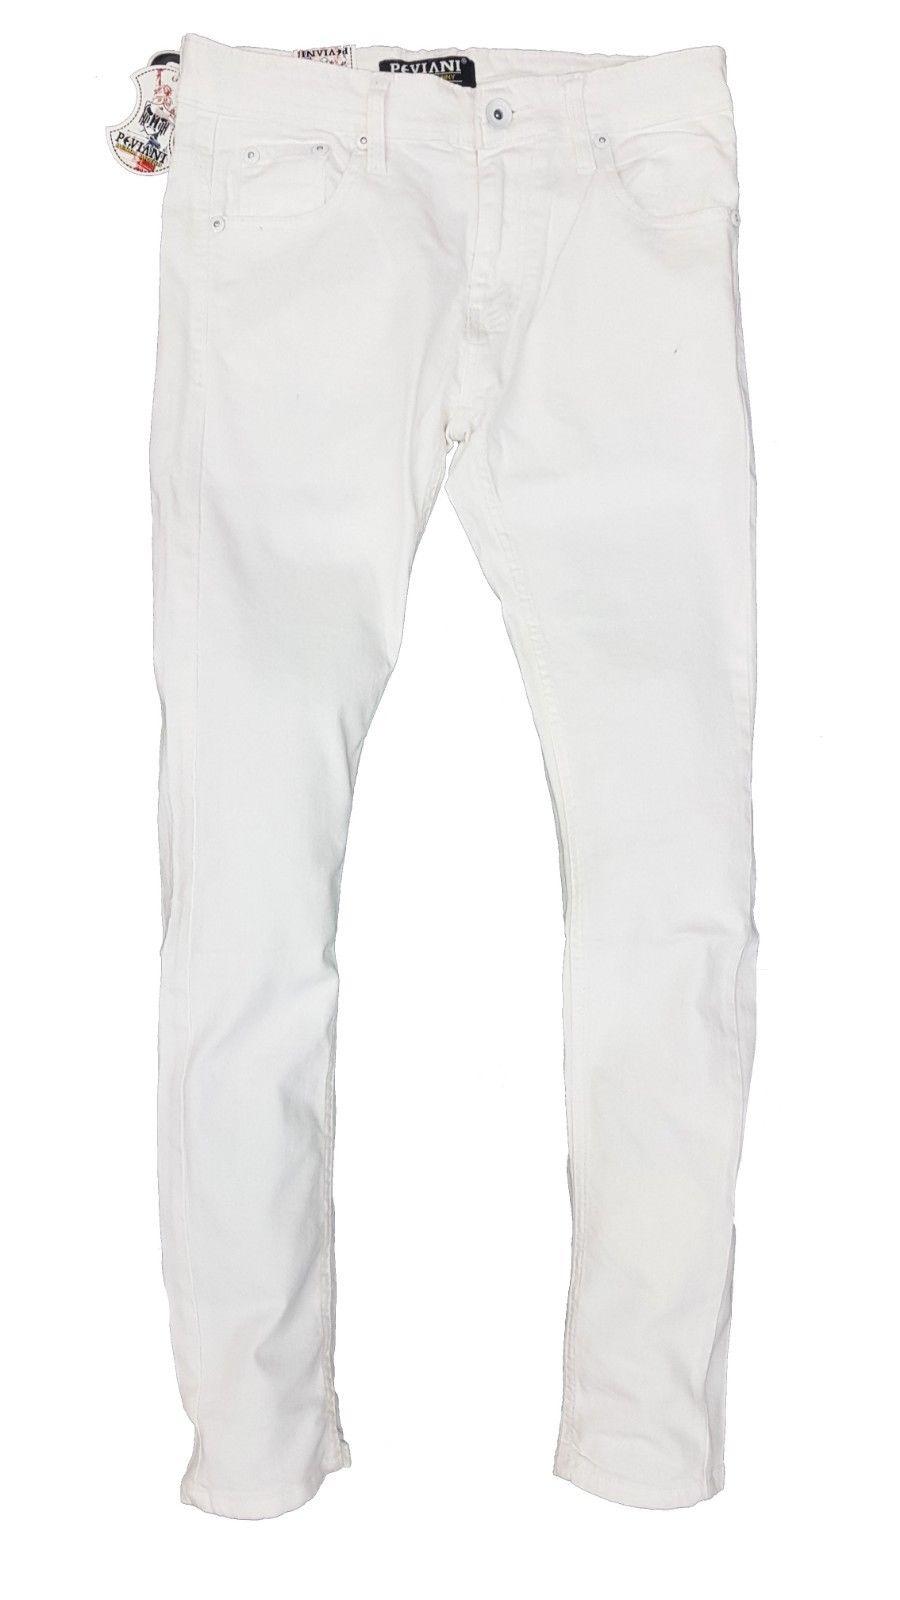 14f61ea7 White Peviani Skinny Stretch Slim Fit Denim — GEORGIO PEVIANI